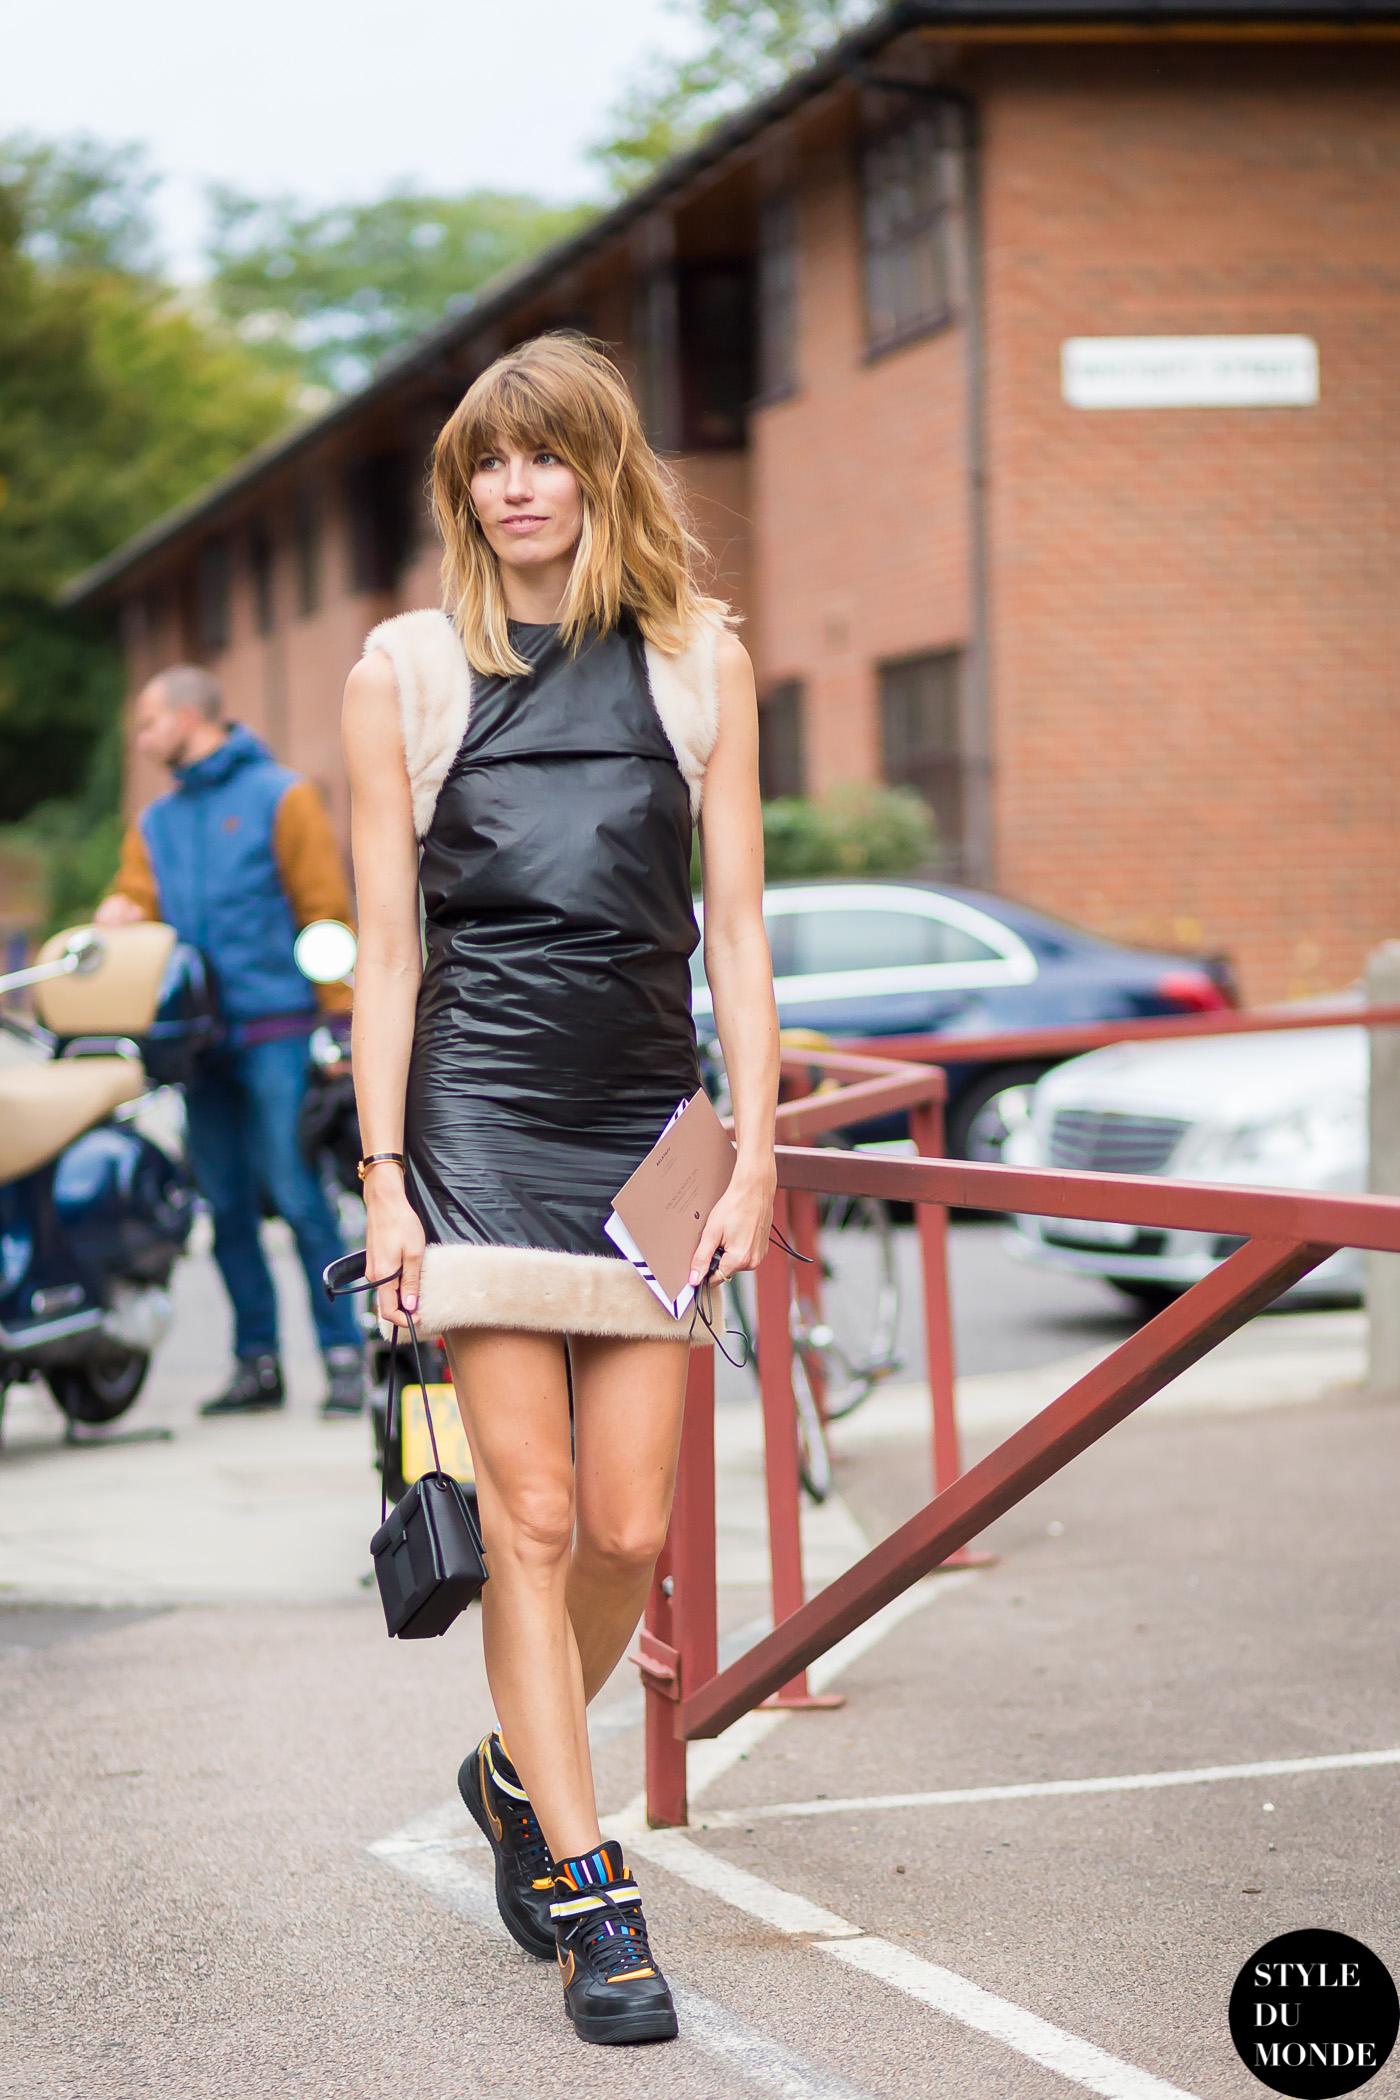 big sale 07e27 79439 London FW SS15 Street Style  Veronika Heilbrunner - STYLE DU MONDE   Street  Style Street Fashion Photos